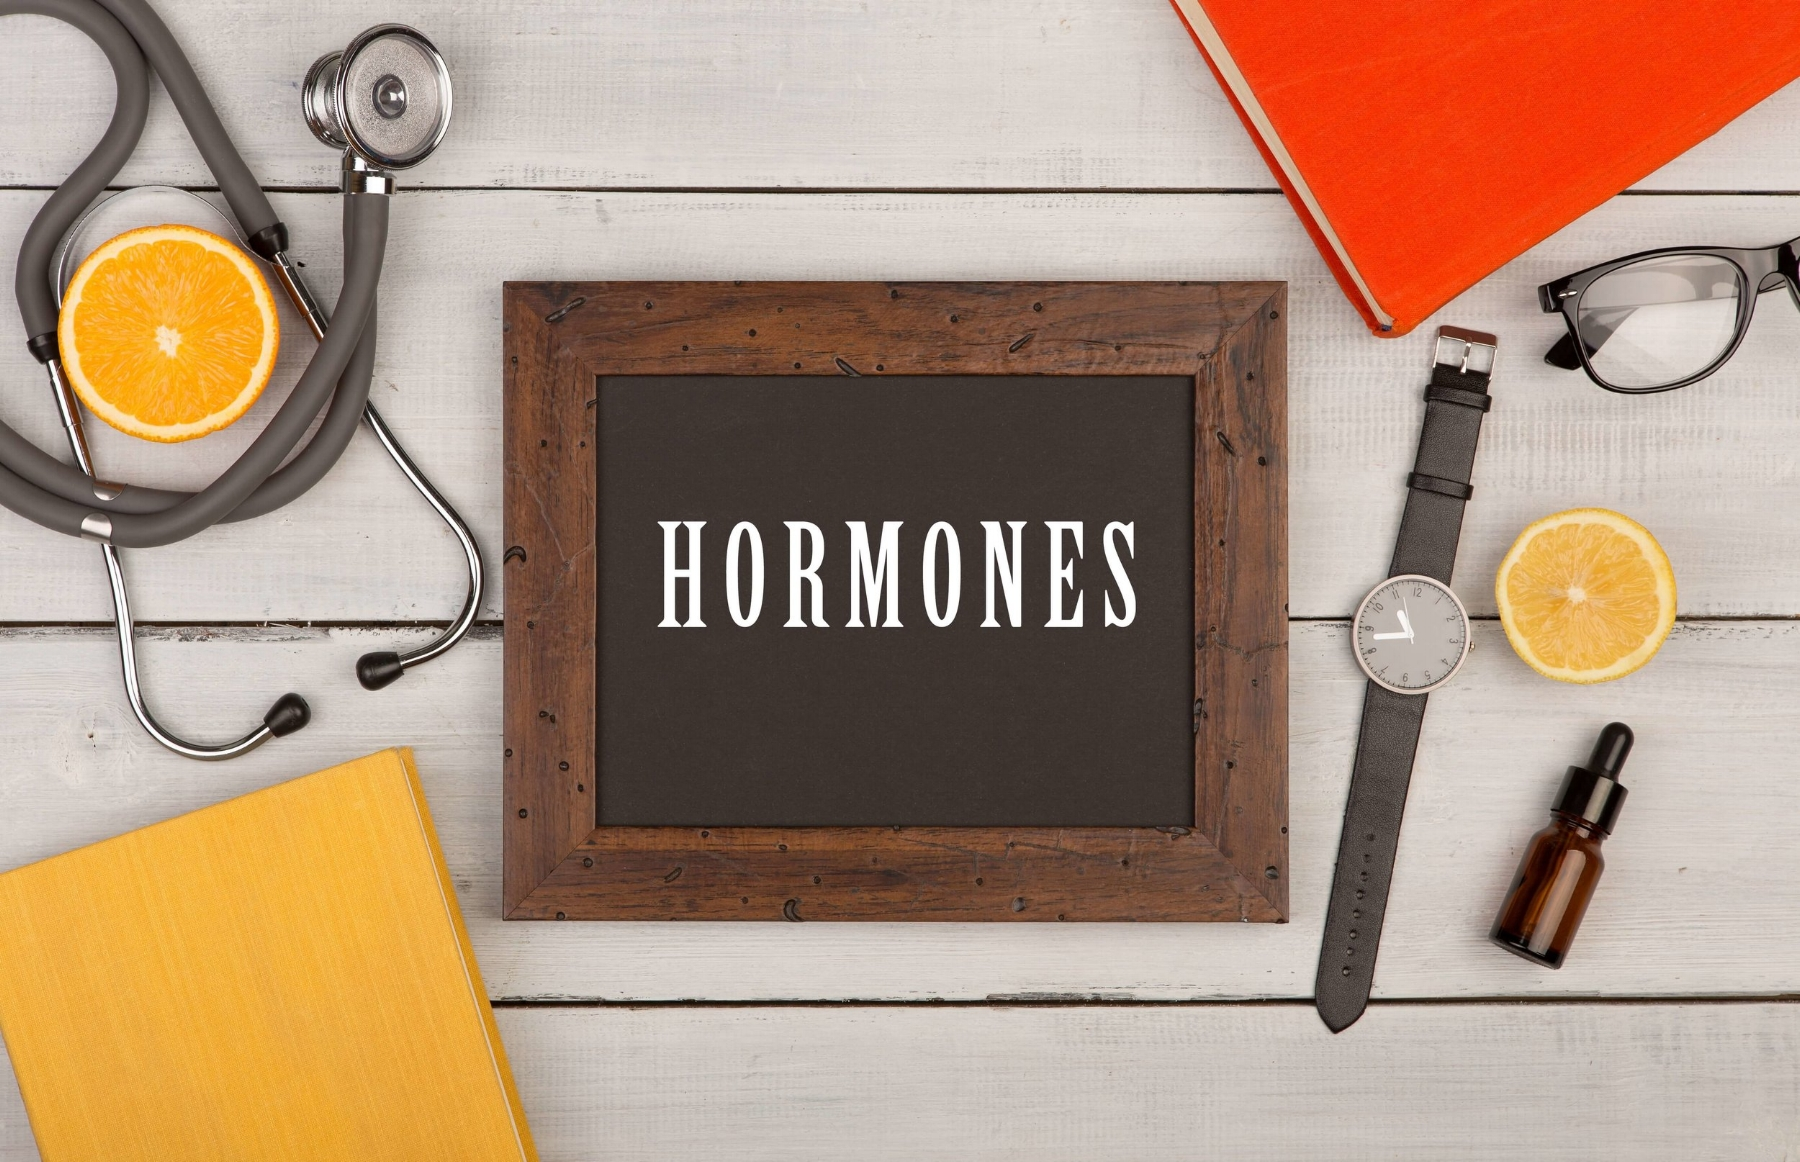 Healthy Hormones ,  Holistic Health ,  Hormones ,  Natural Doctors ,  Naturopath Victoria , Naturopathic Doctor Victoria BC ,  Woman's Health ,  YYJ